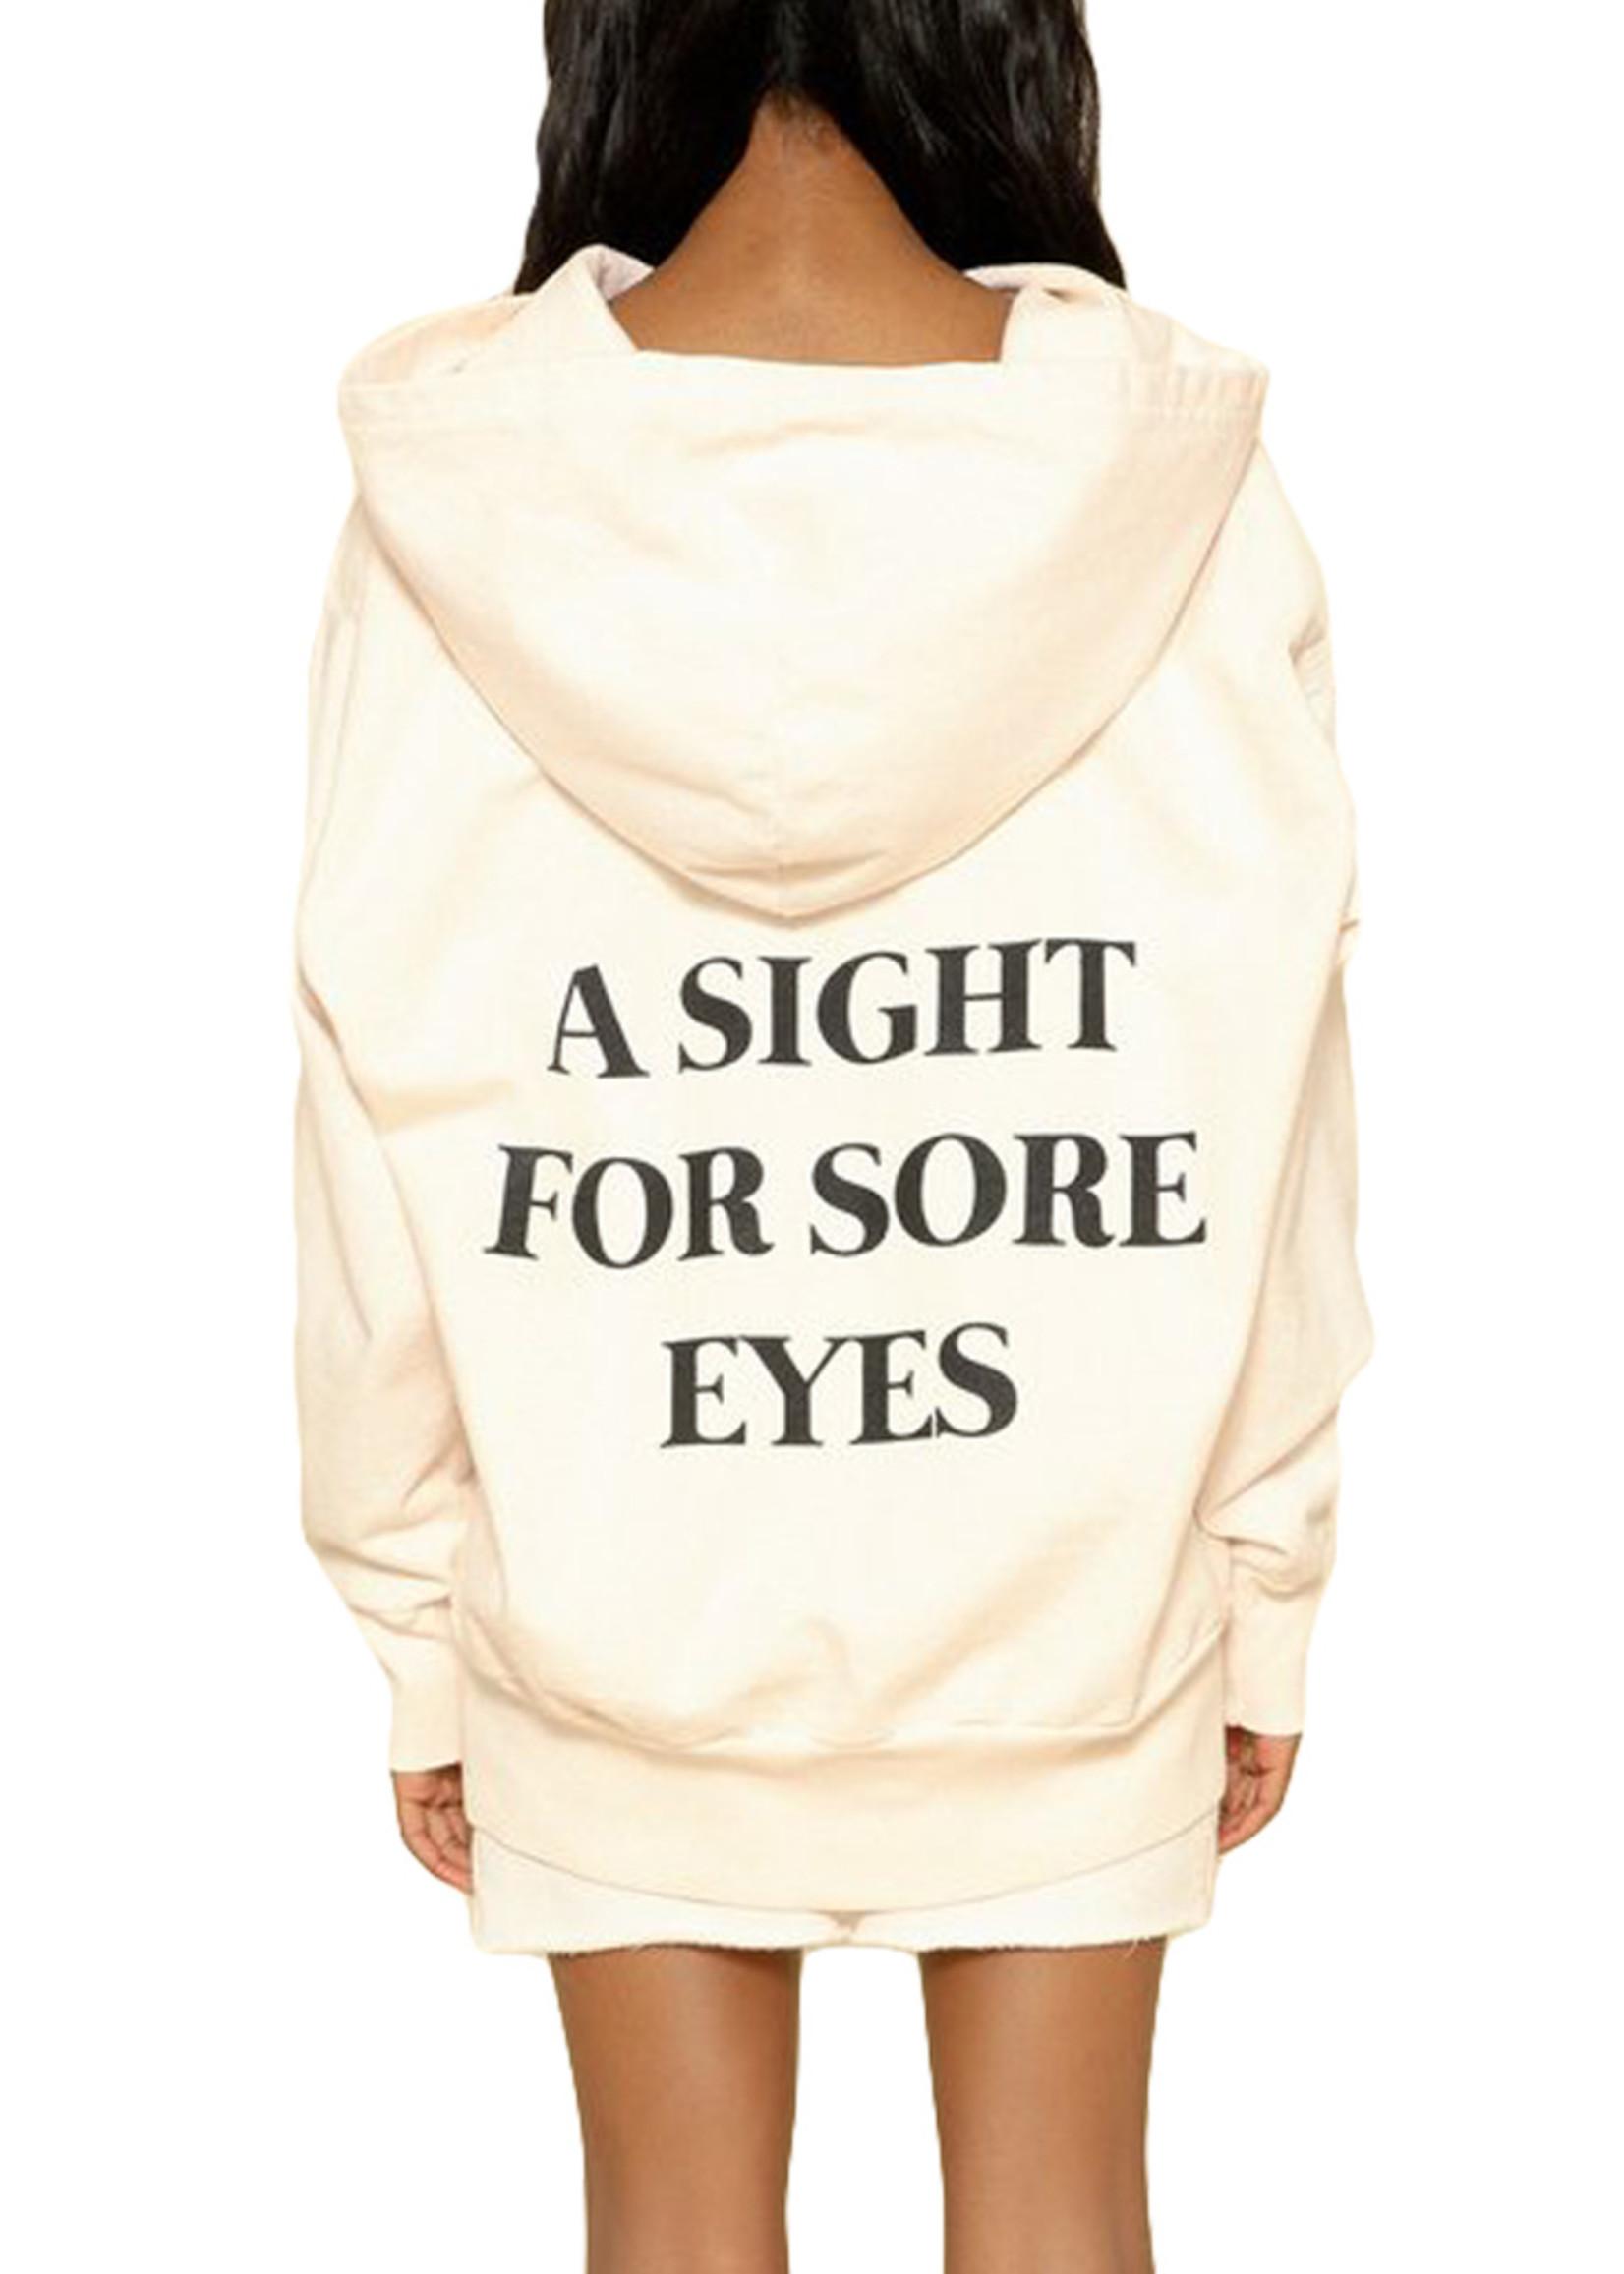 BOYS LIE BOYS LIE / A Sight For Sore Eyes Hoodie